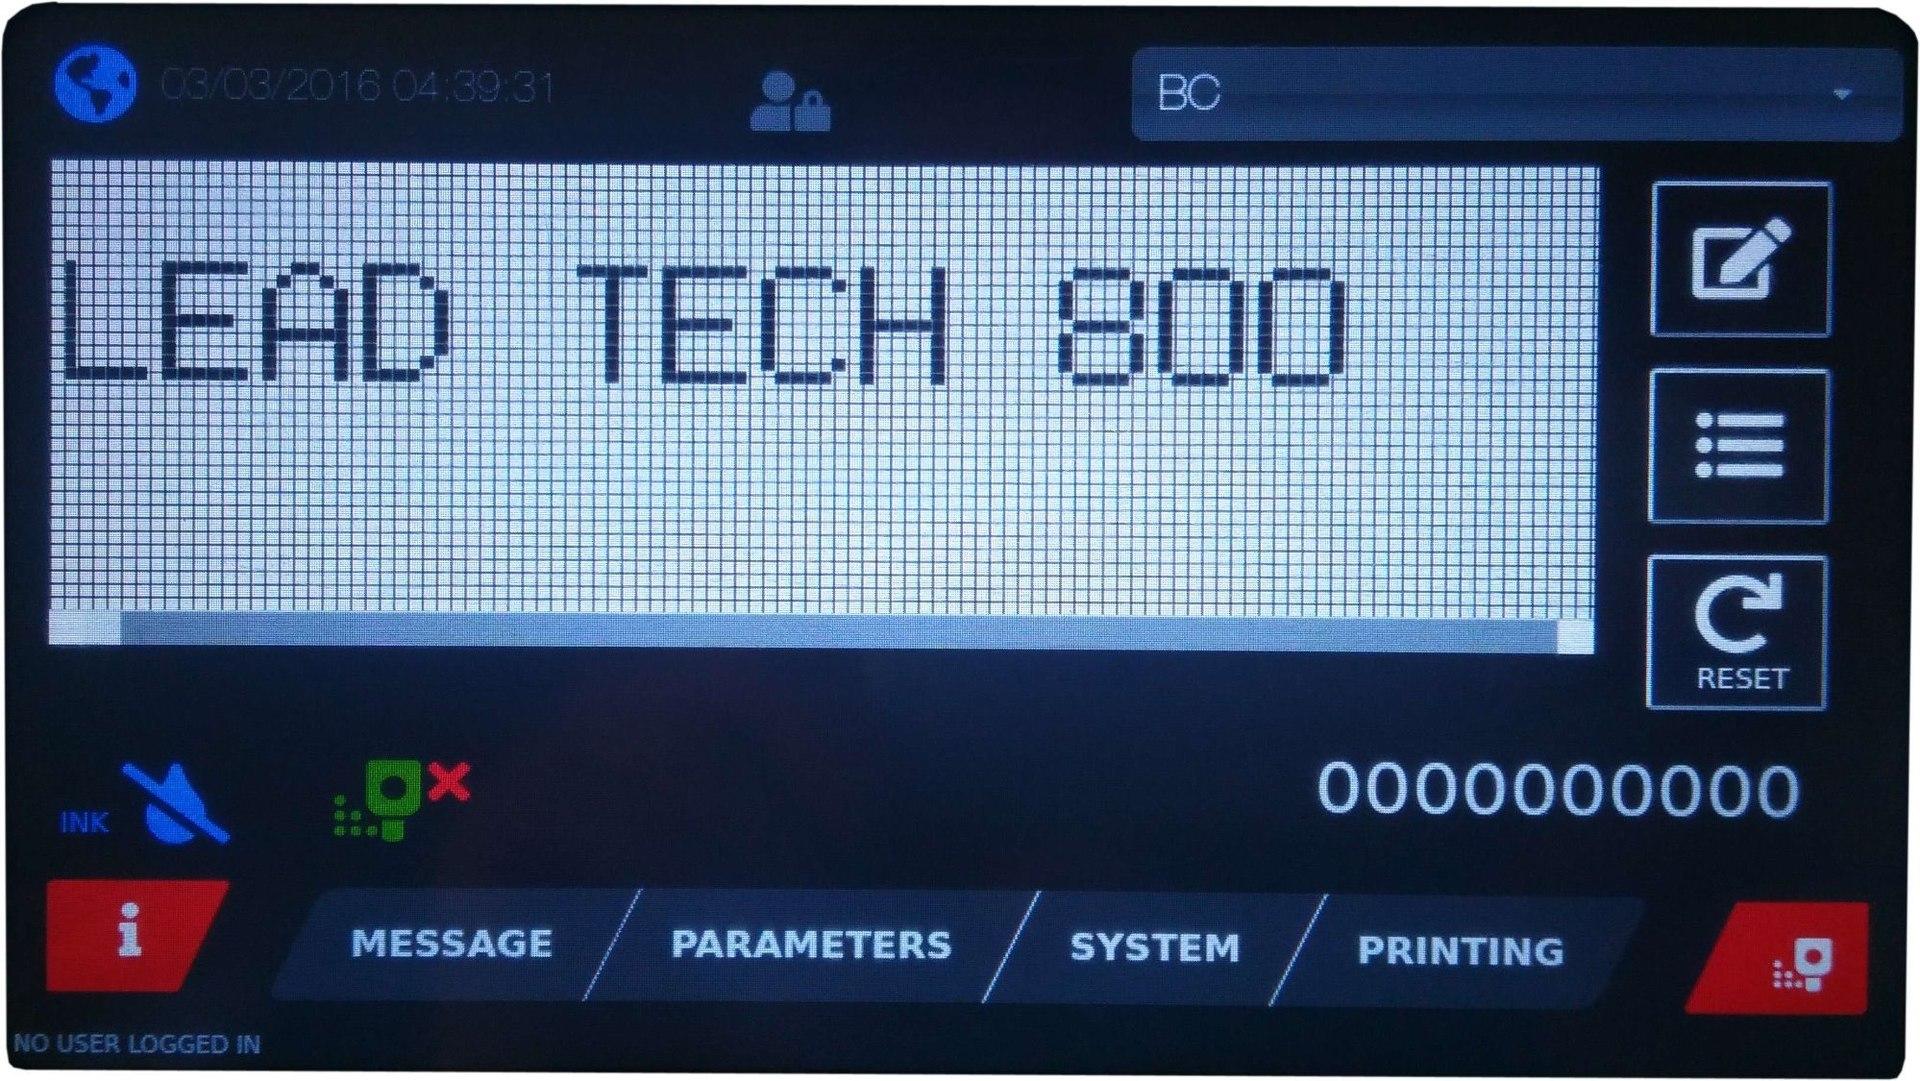 Lead Tech Egg Coding Continuous Inkjet Printer Lt800